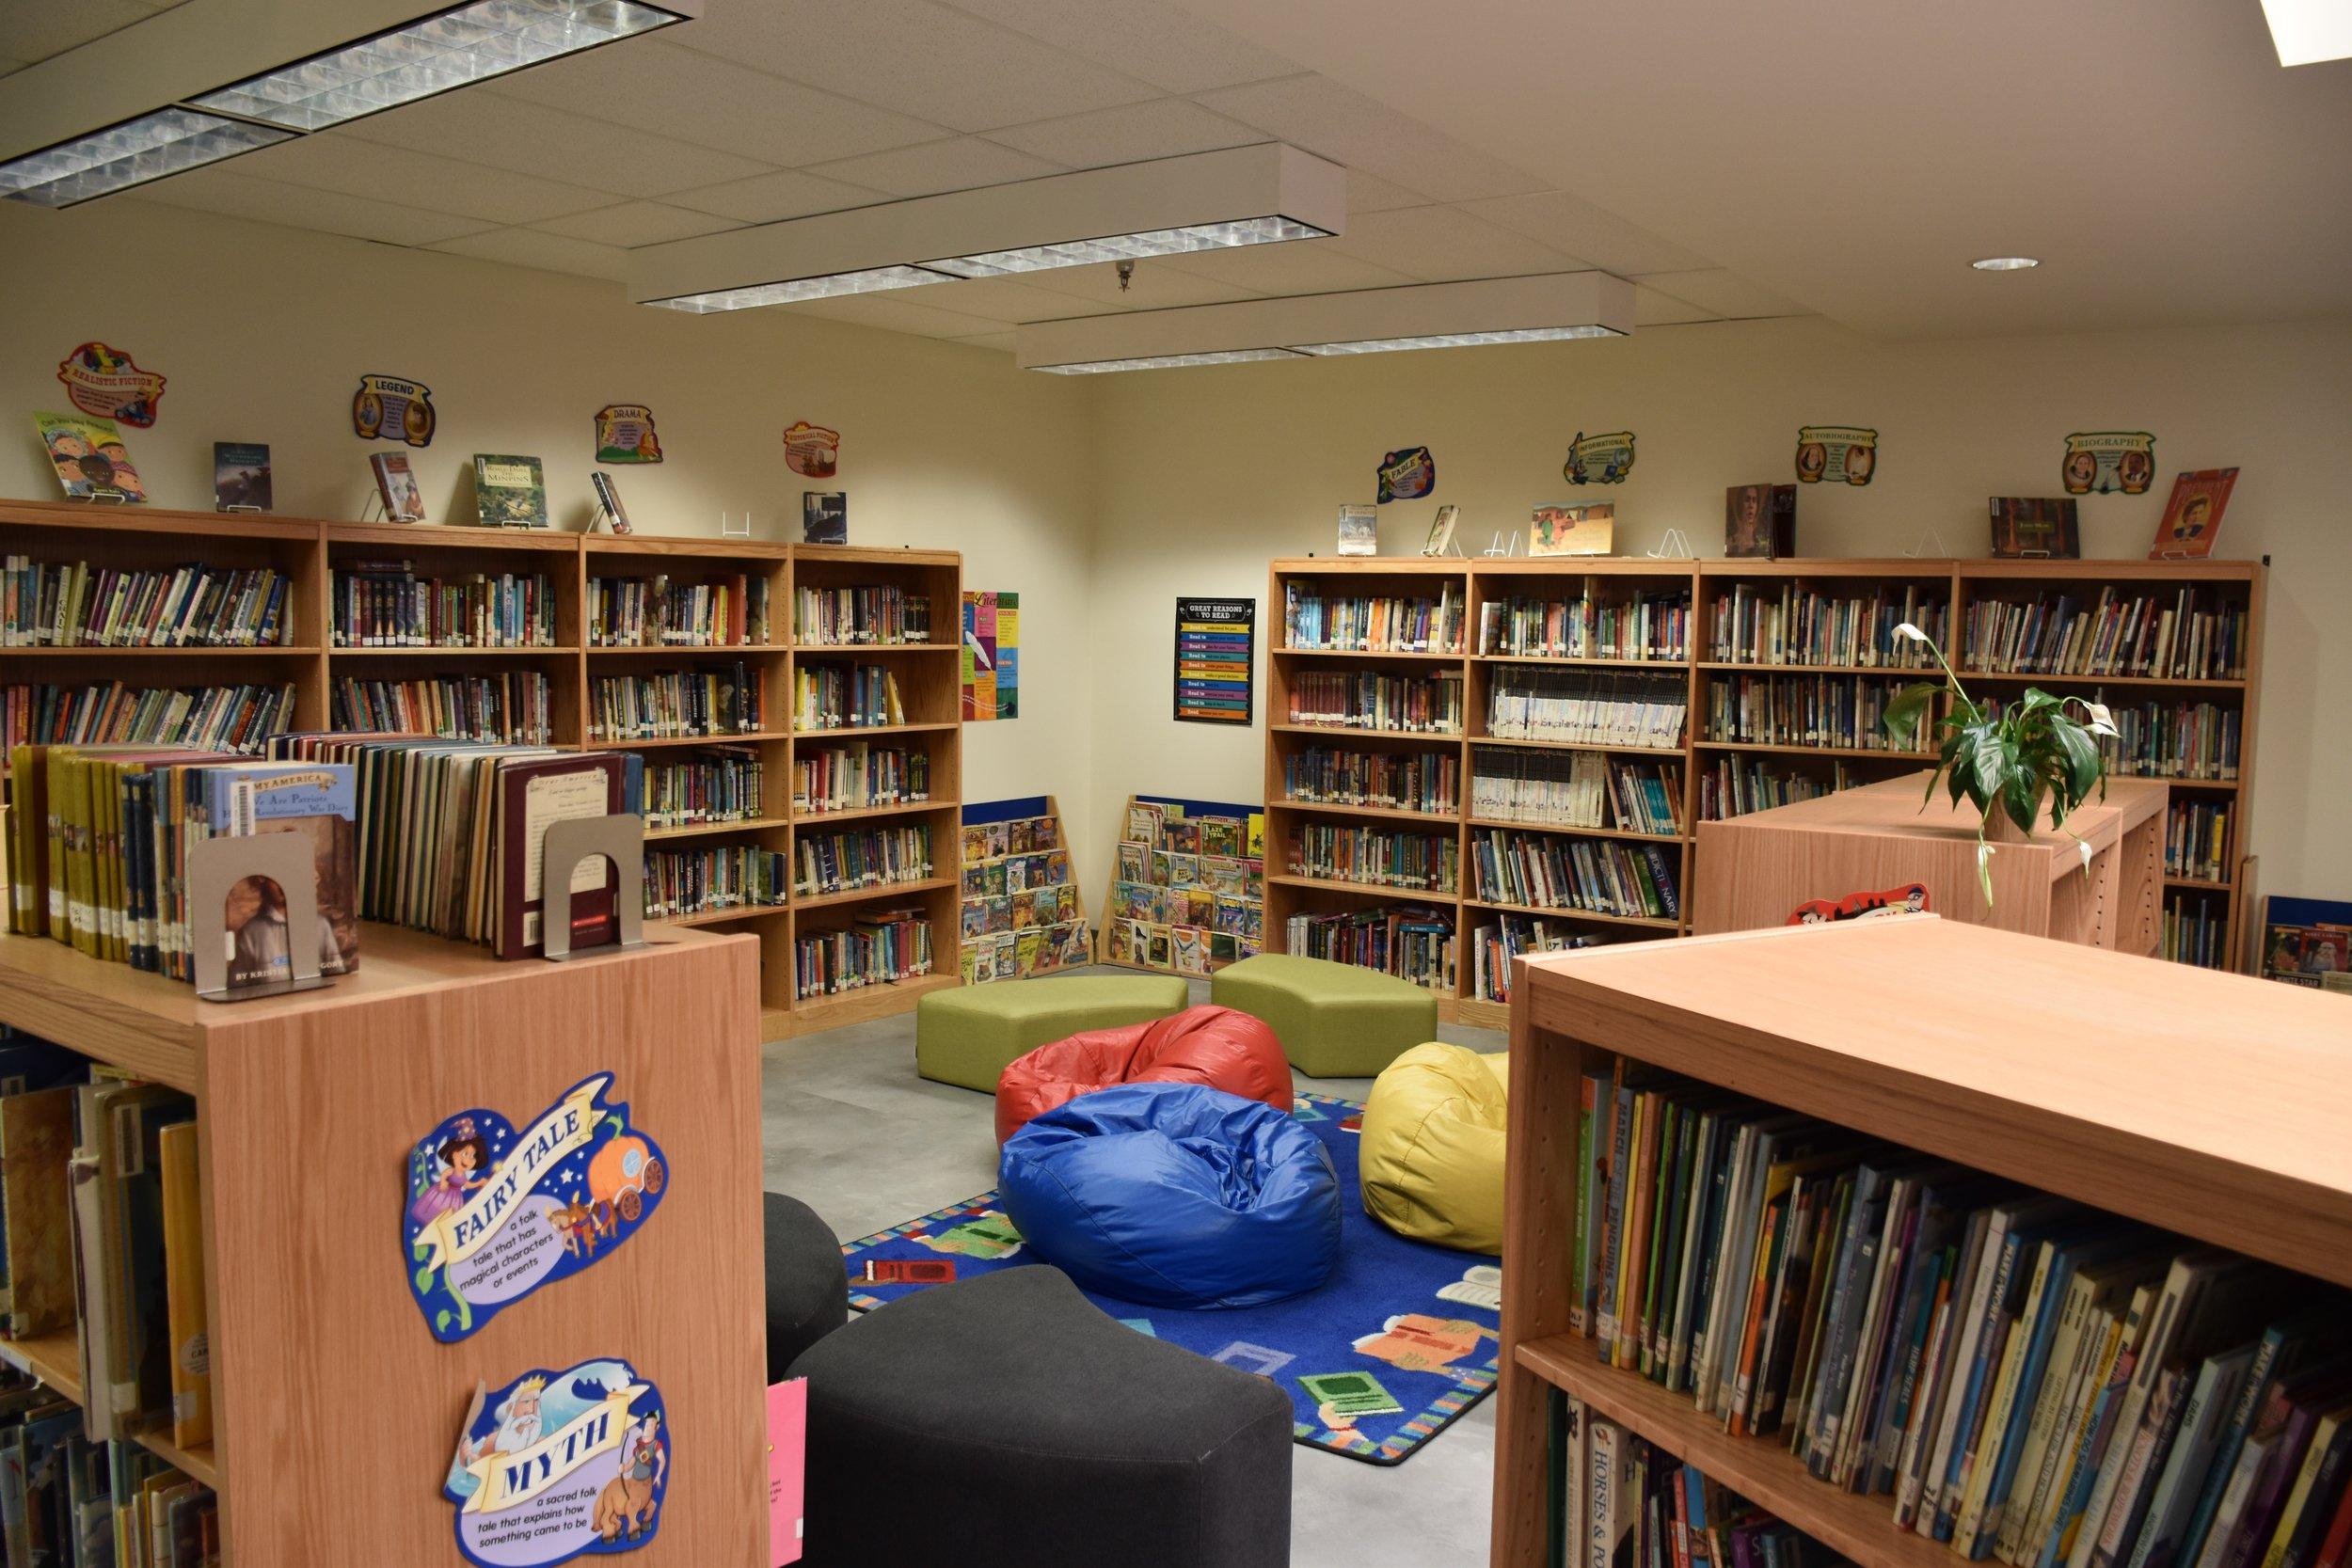 17-18_Library1.jpg